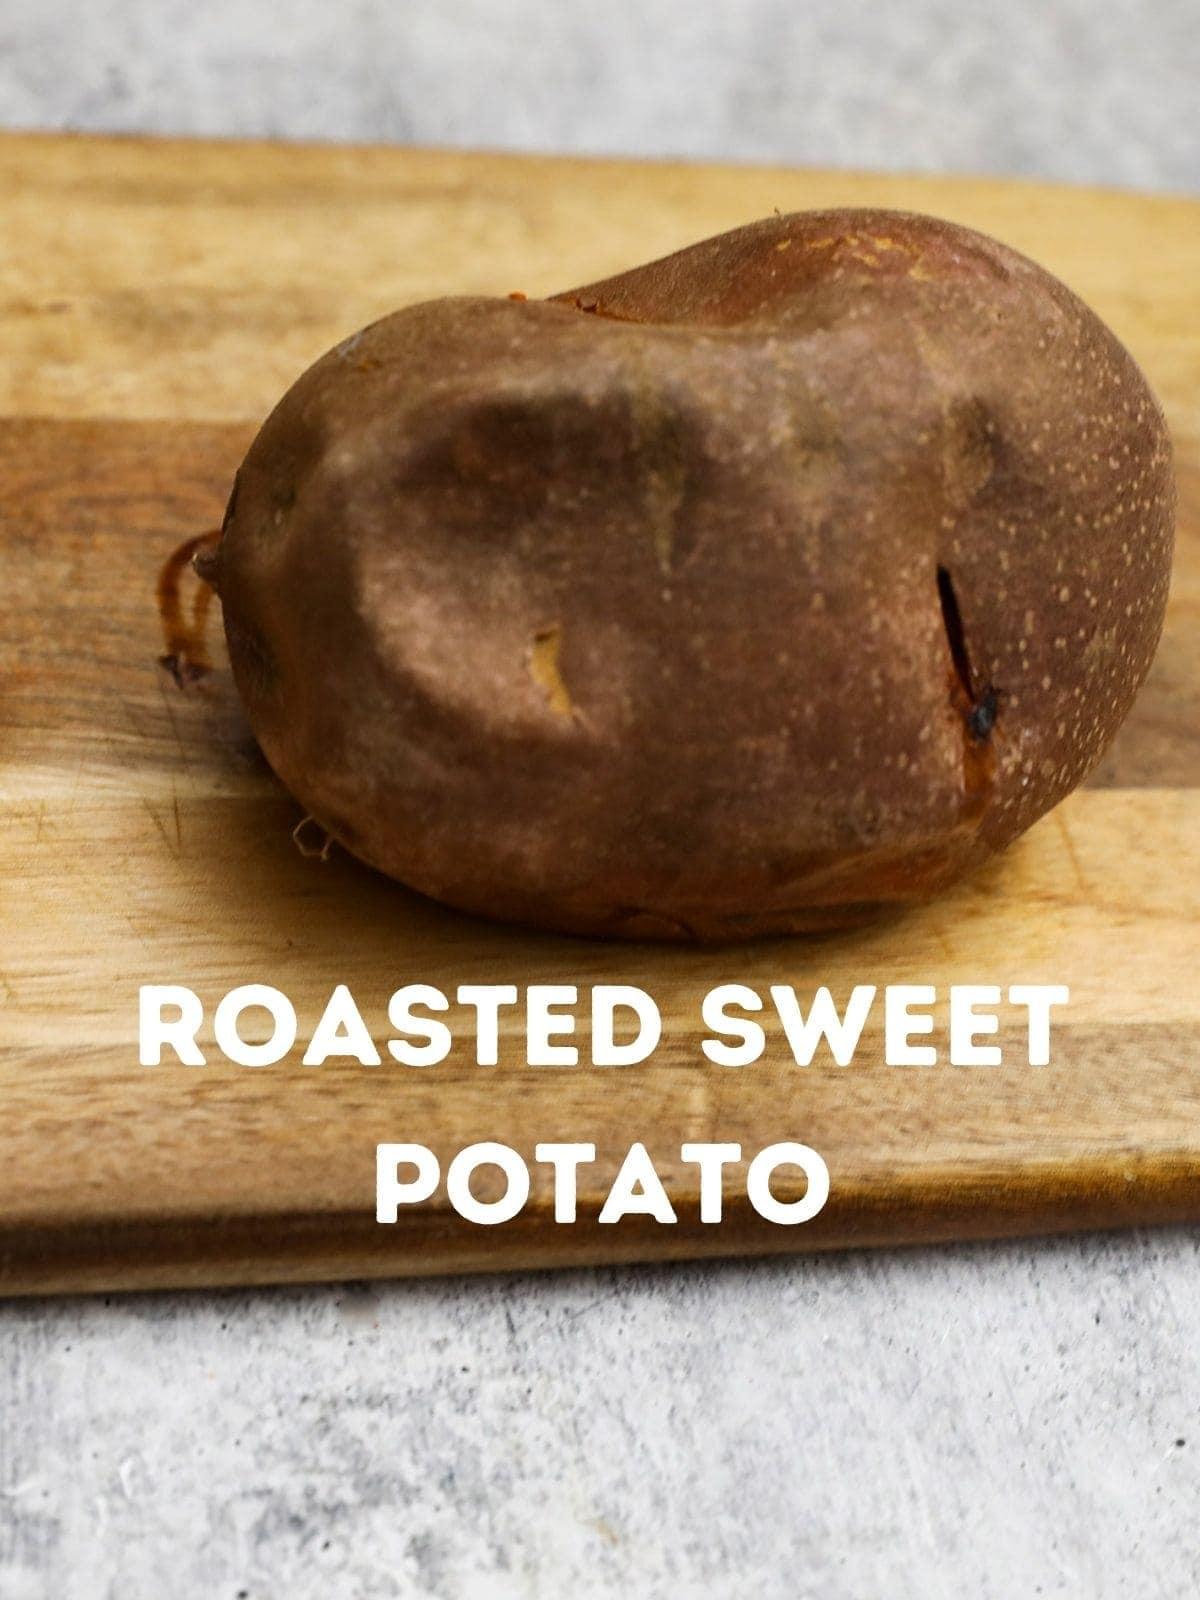 Roast Sweet potato on cutting board